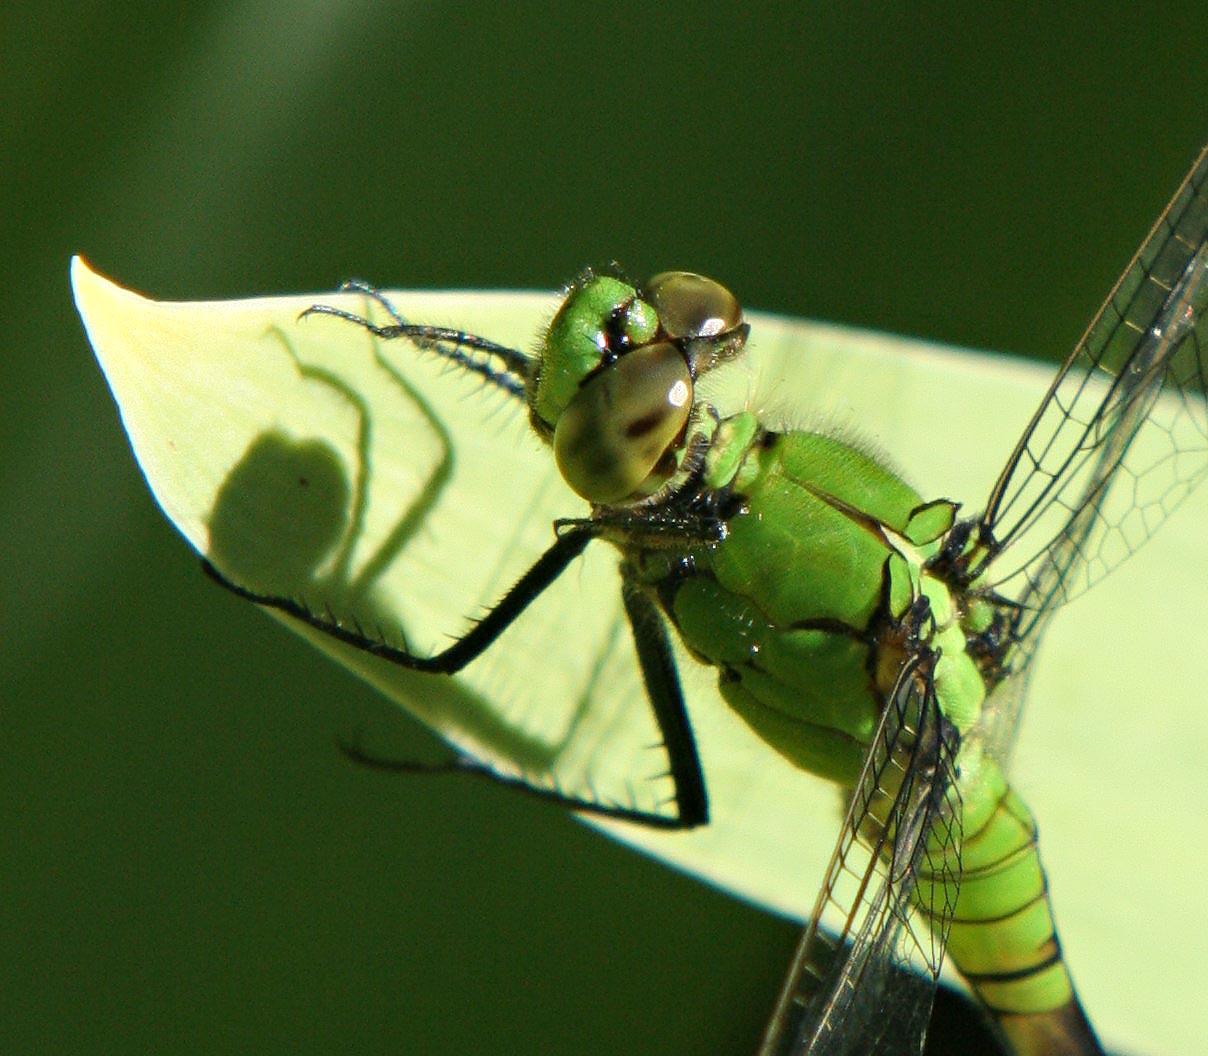 100% Green Dragonfly crop